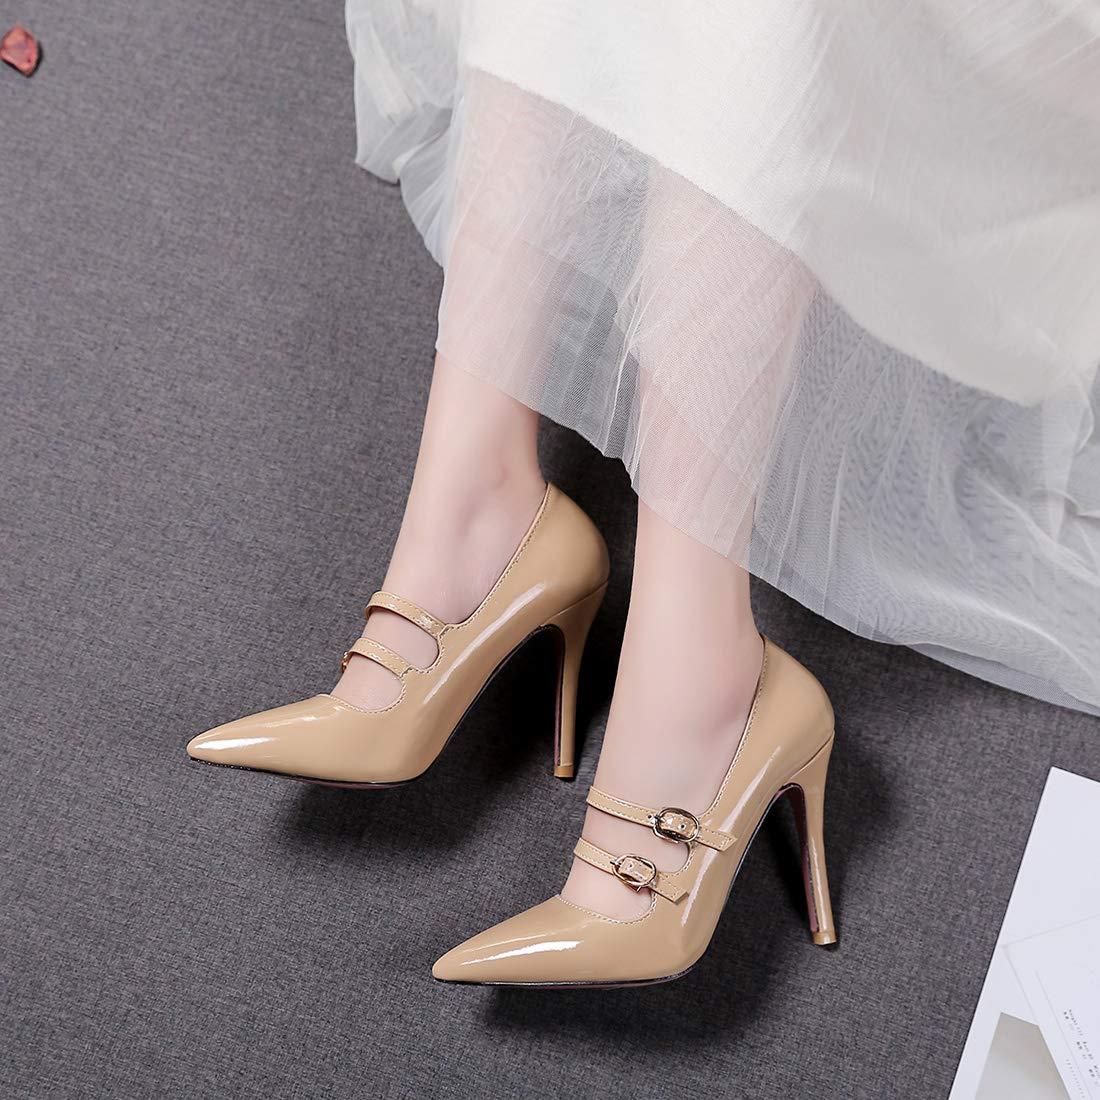 Womens Girls Mary Jane Pointy-Toe Stiletto High Heels Dress Pumps